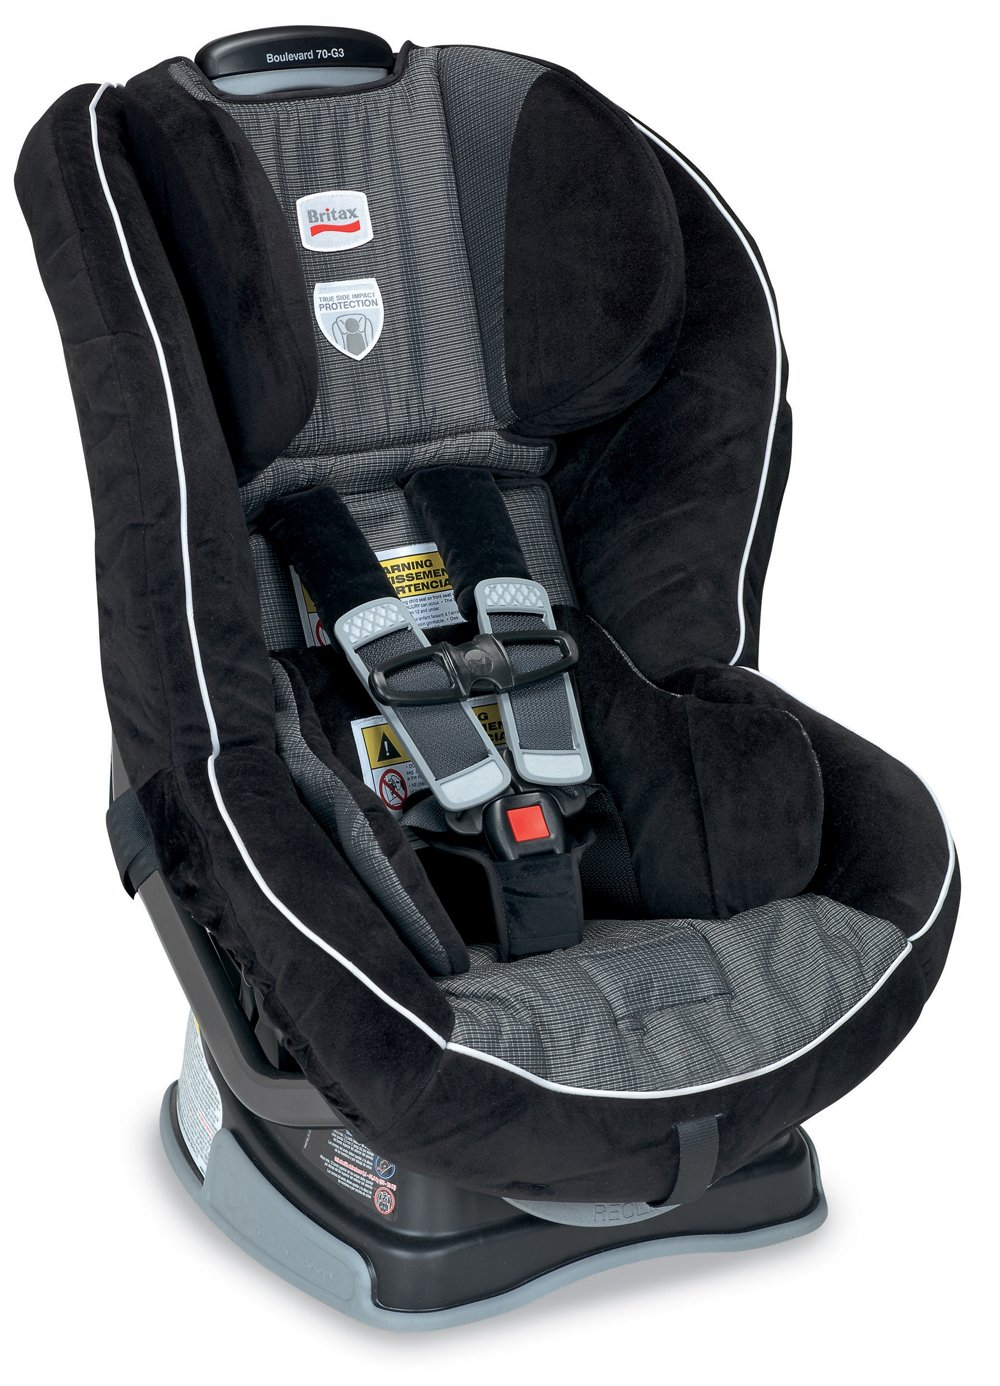 BritaxBoulevard Convertible 70-G3 Convertible Car Seat